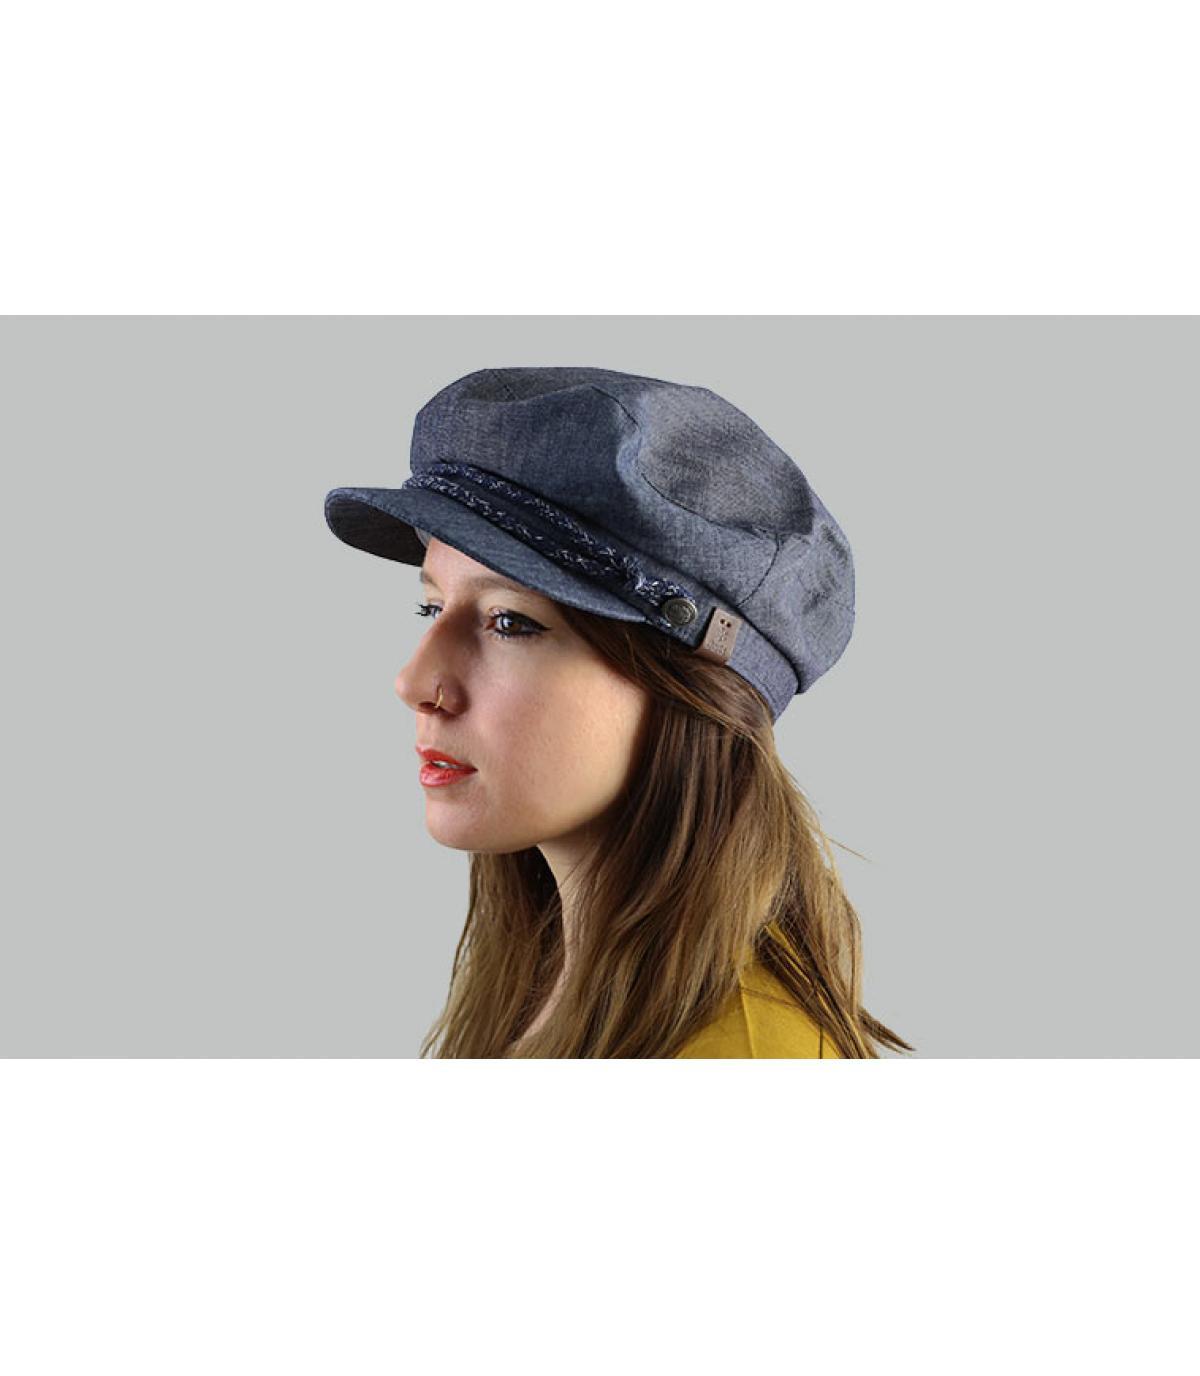 cappello blu marinaio